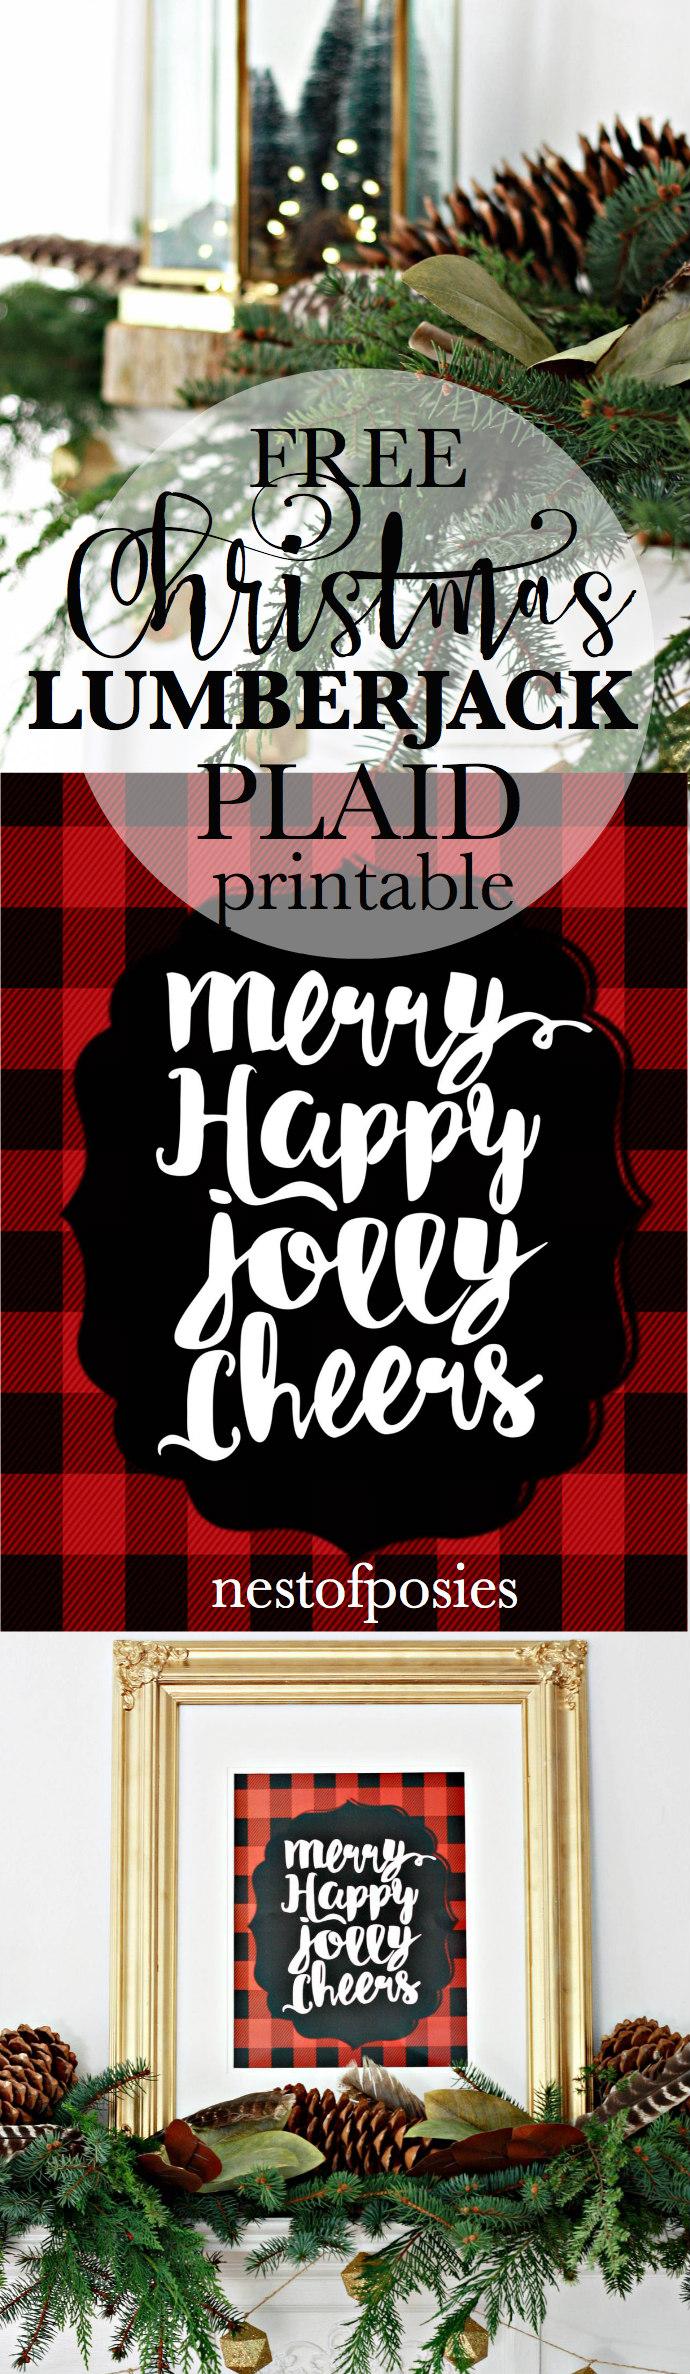 Free Christmas Lumberjack Plaid Printable